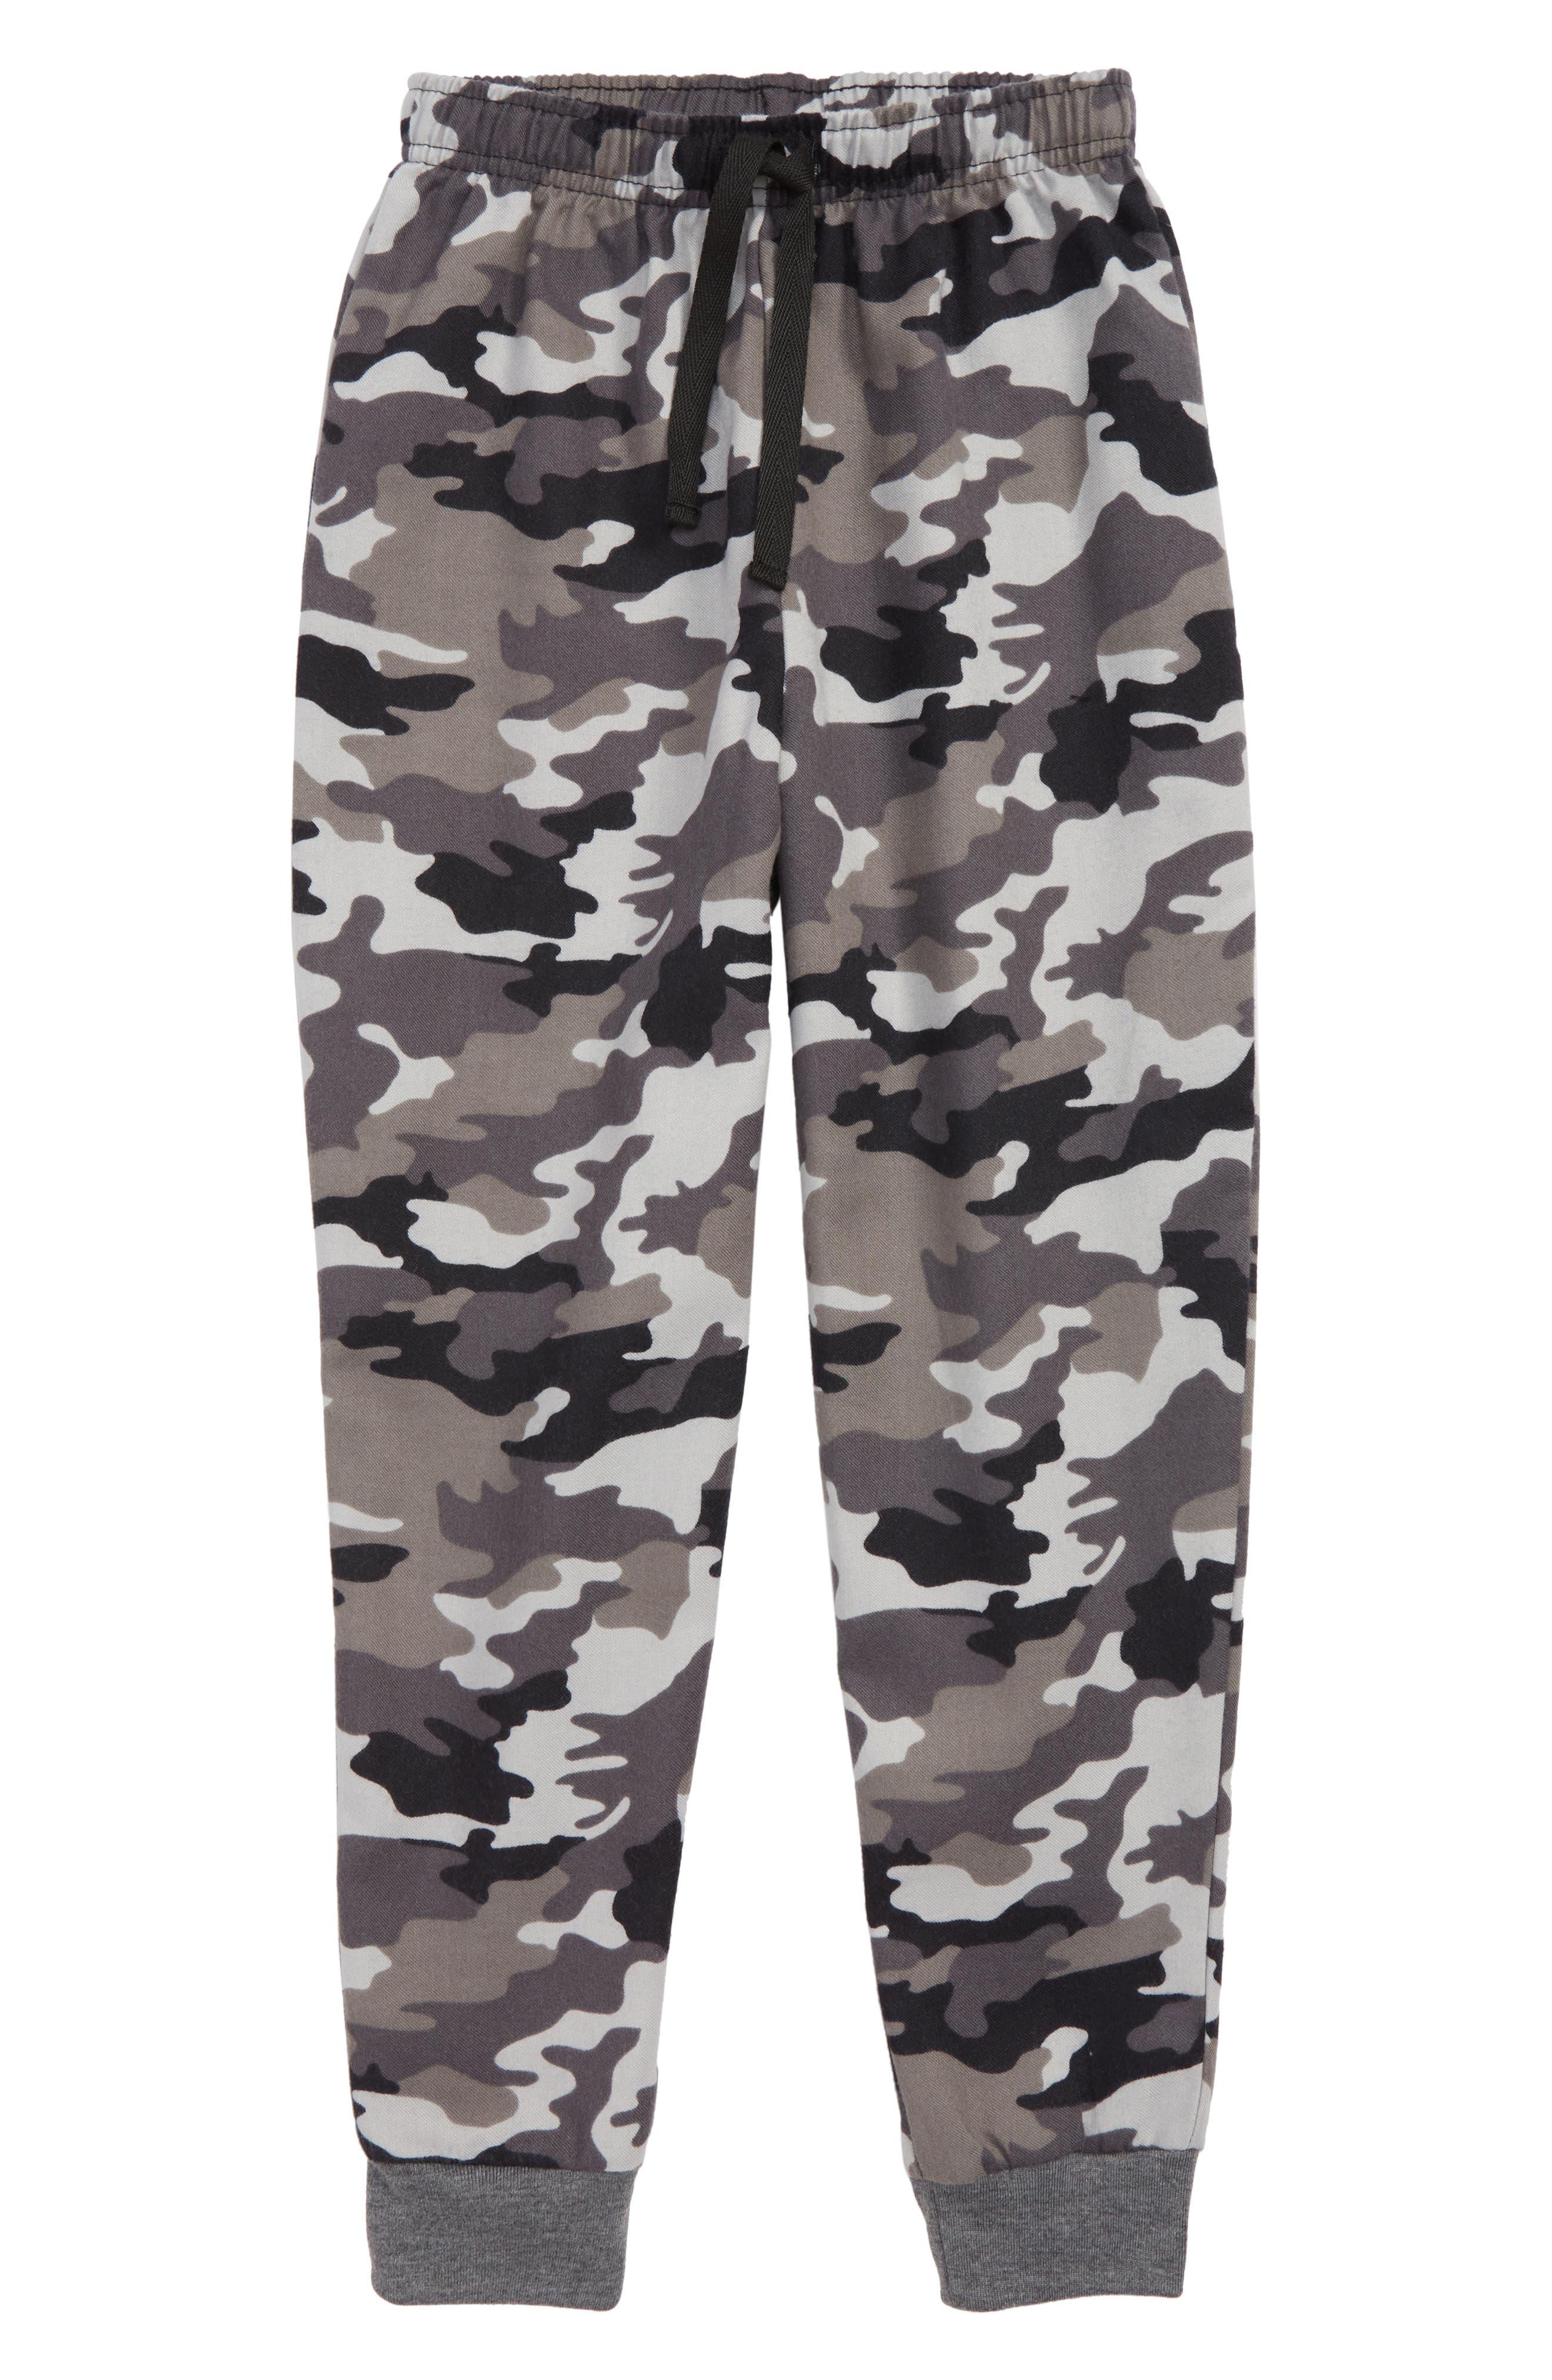 Flannel Jogger Pants,                             Main thumbnail 1, color,                             021